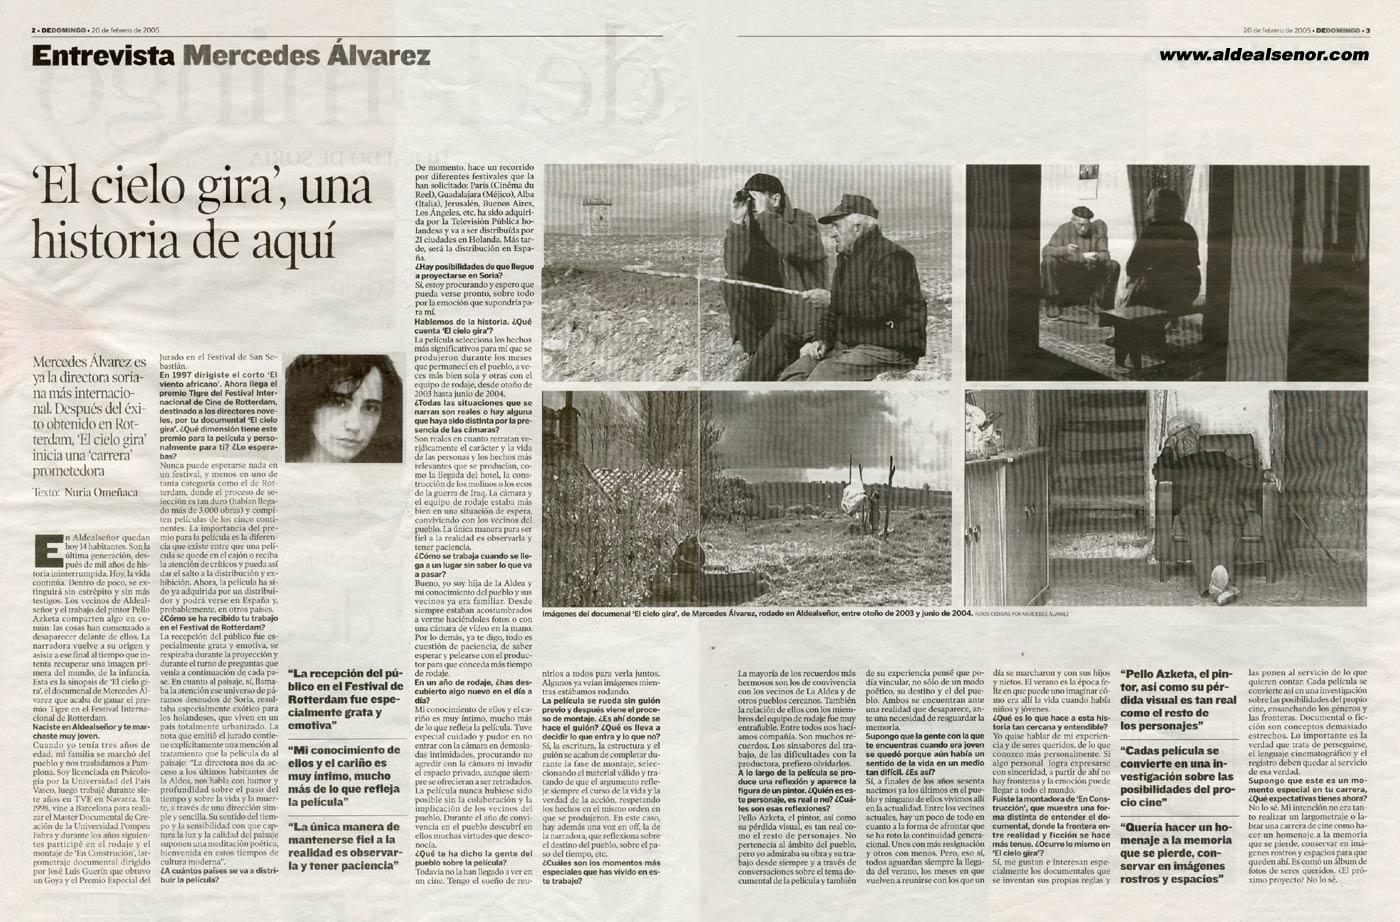 ALDEALSEÑOR - Heraldo de Soria - Entrevista Mercedes Álvarez b12316f3b523